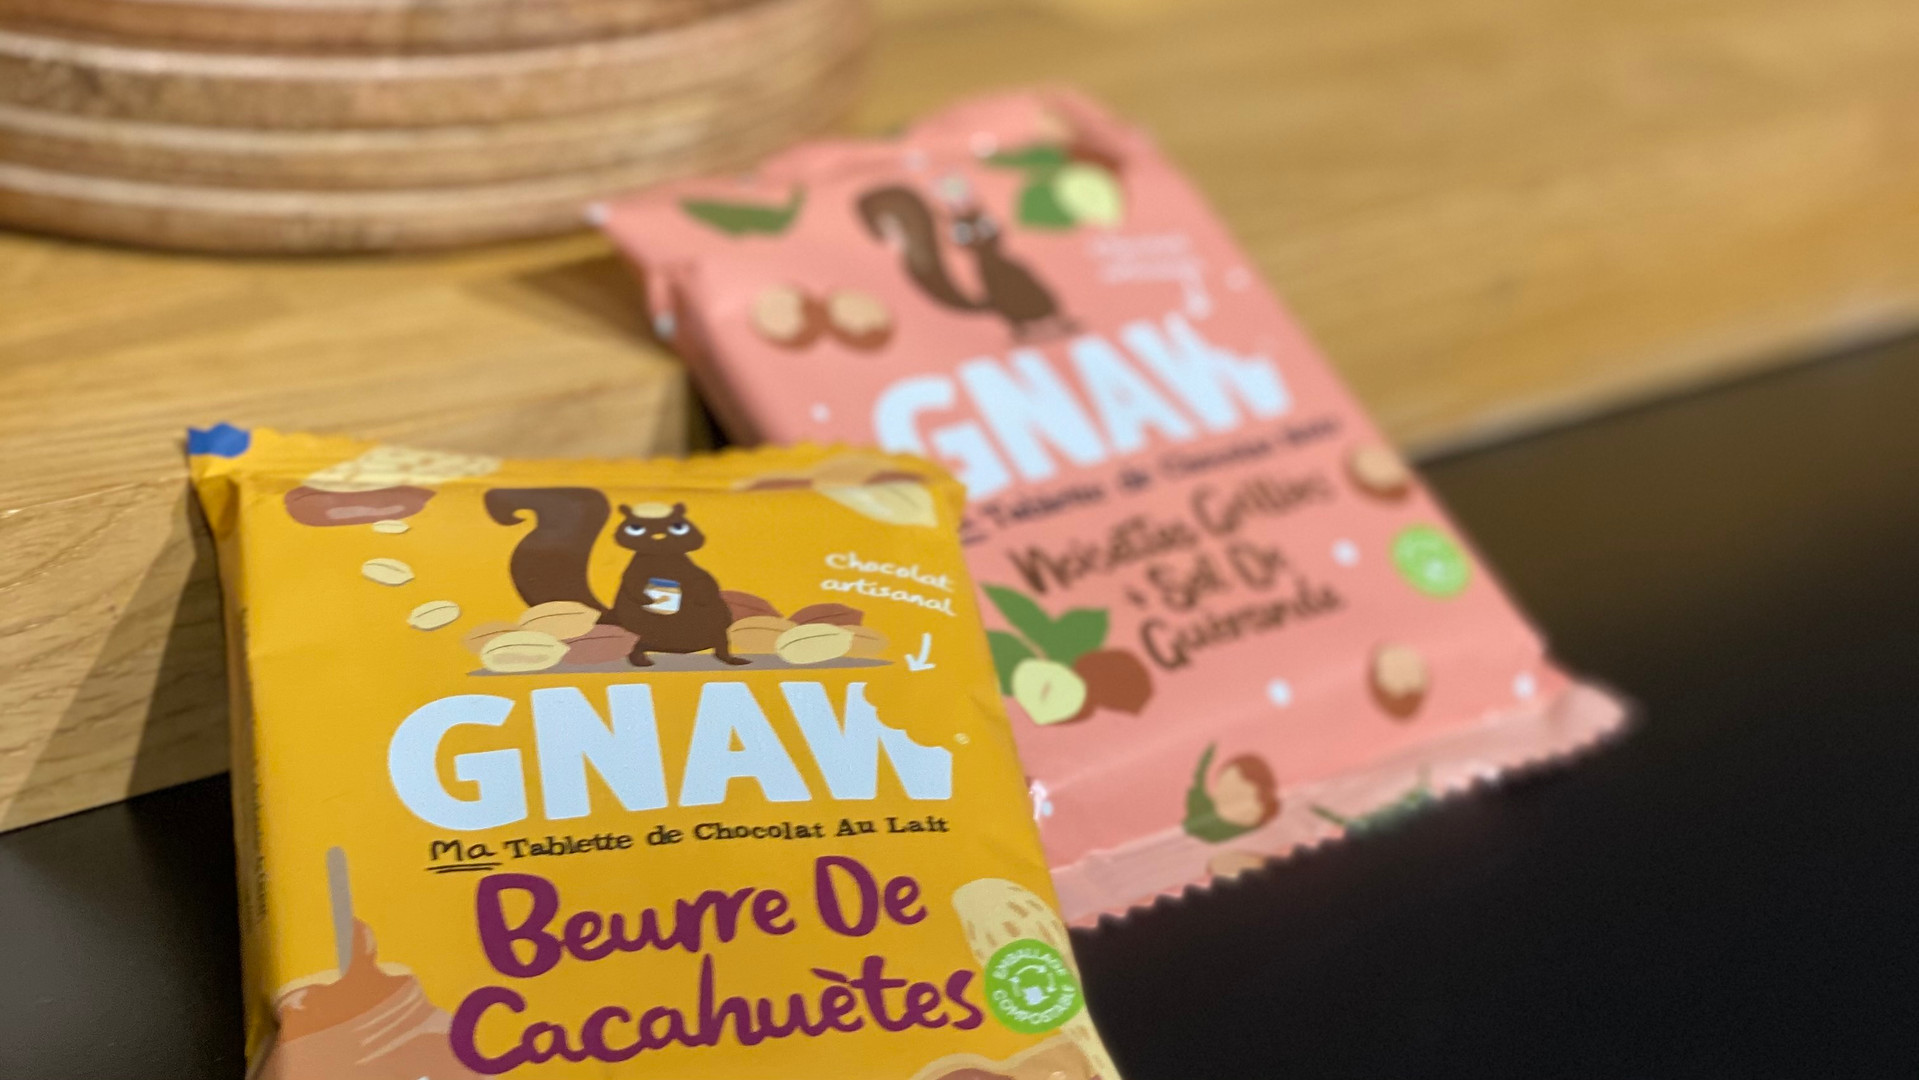 GNAW CHOCOLAT FRANCE